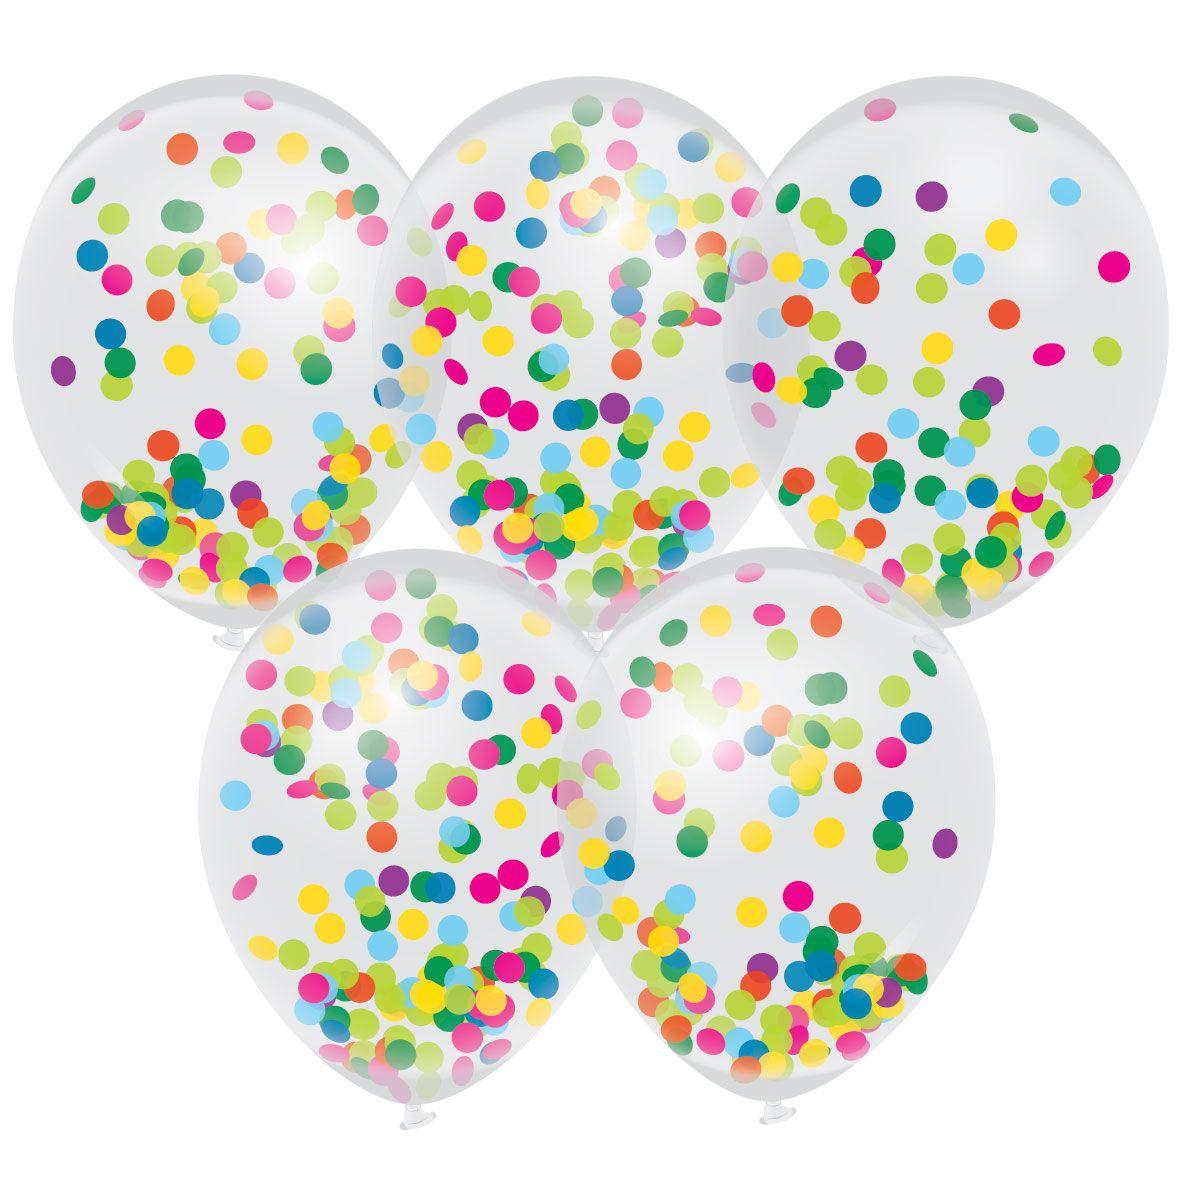 Confetti ballonnen zijdevloei kleur per 5 stuks